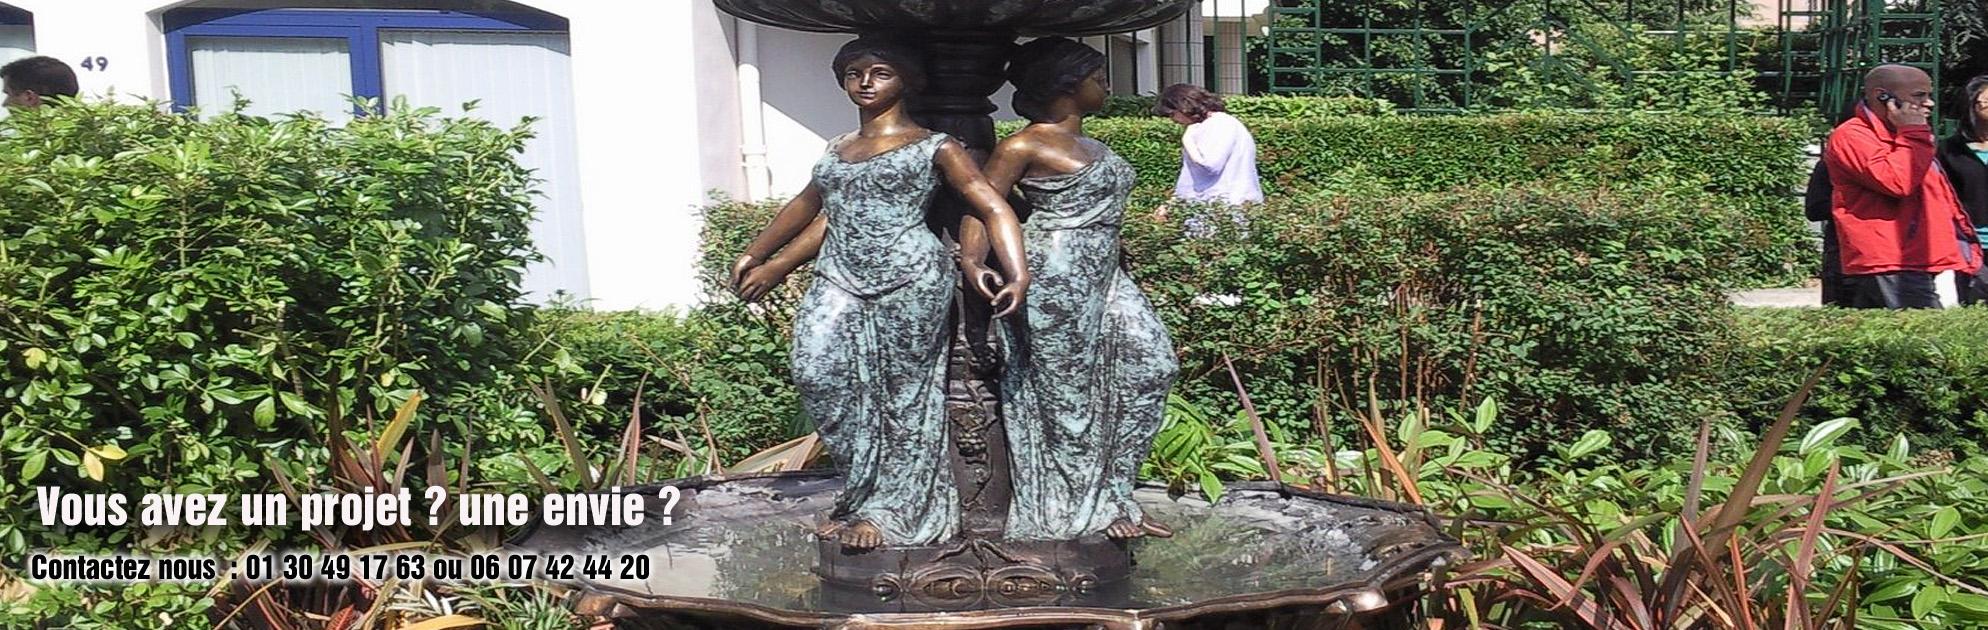 fontaine bronze vasque